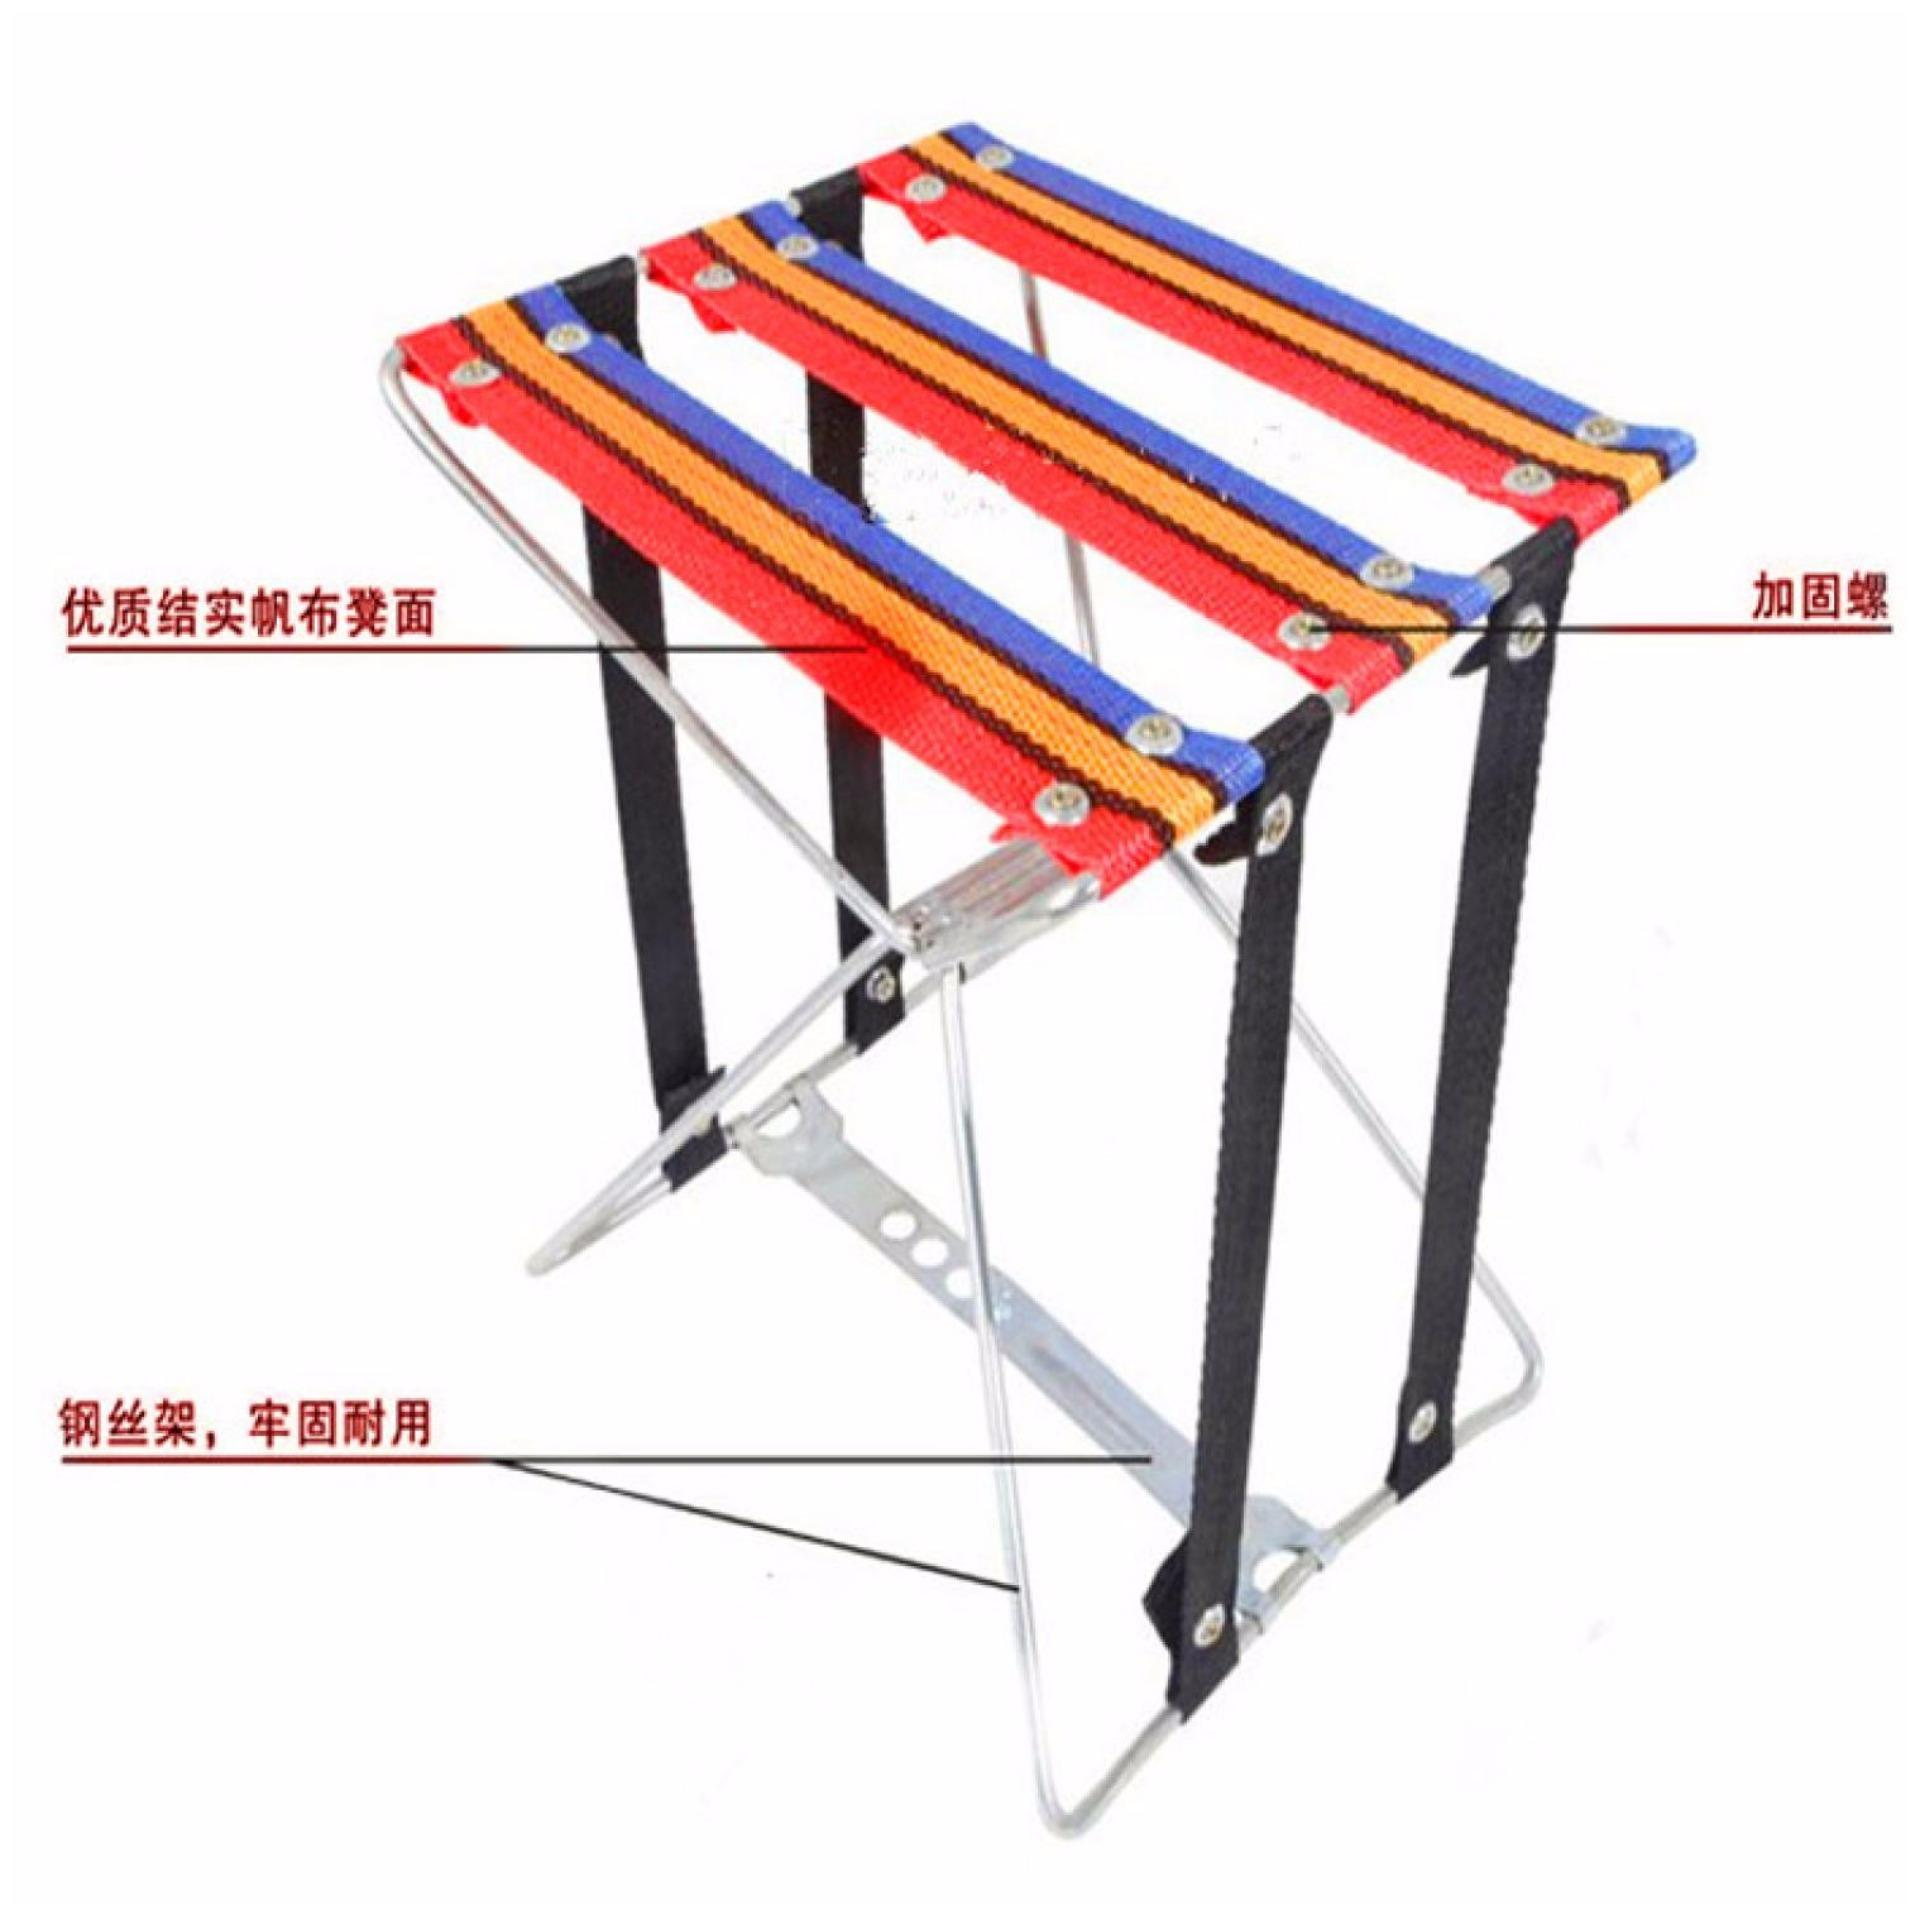 Amazing Portable Pocket Chair Kursi Bangku Lipat Kecil Kereta Piknik Kursi Lipat Memancing Folding Stool Chair